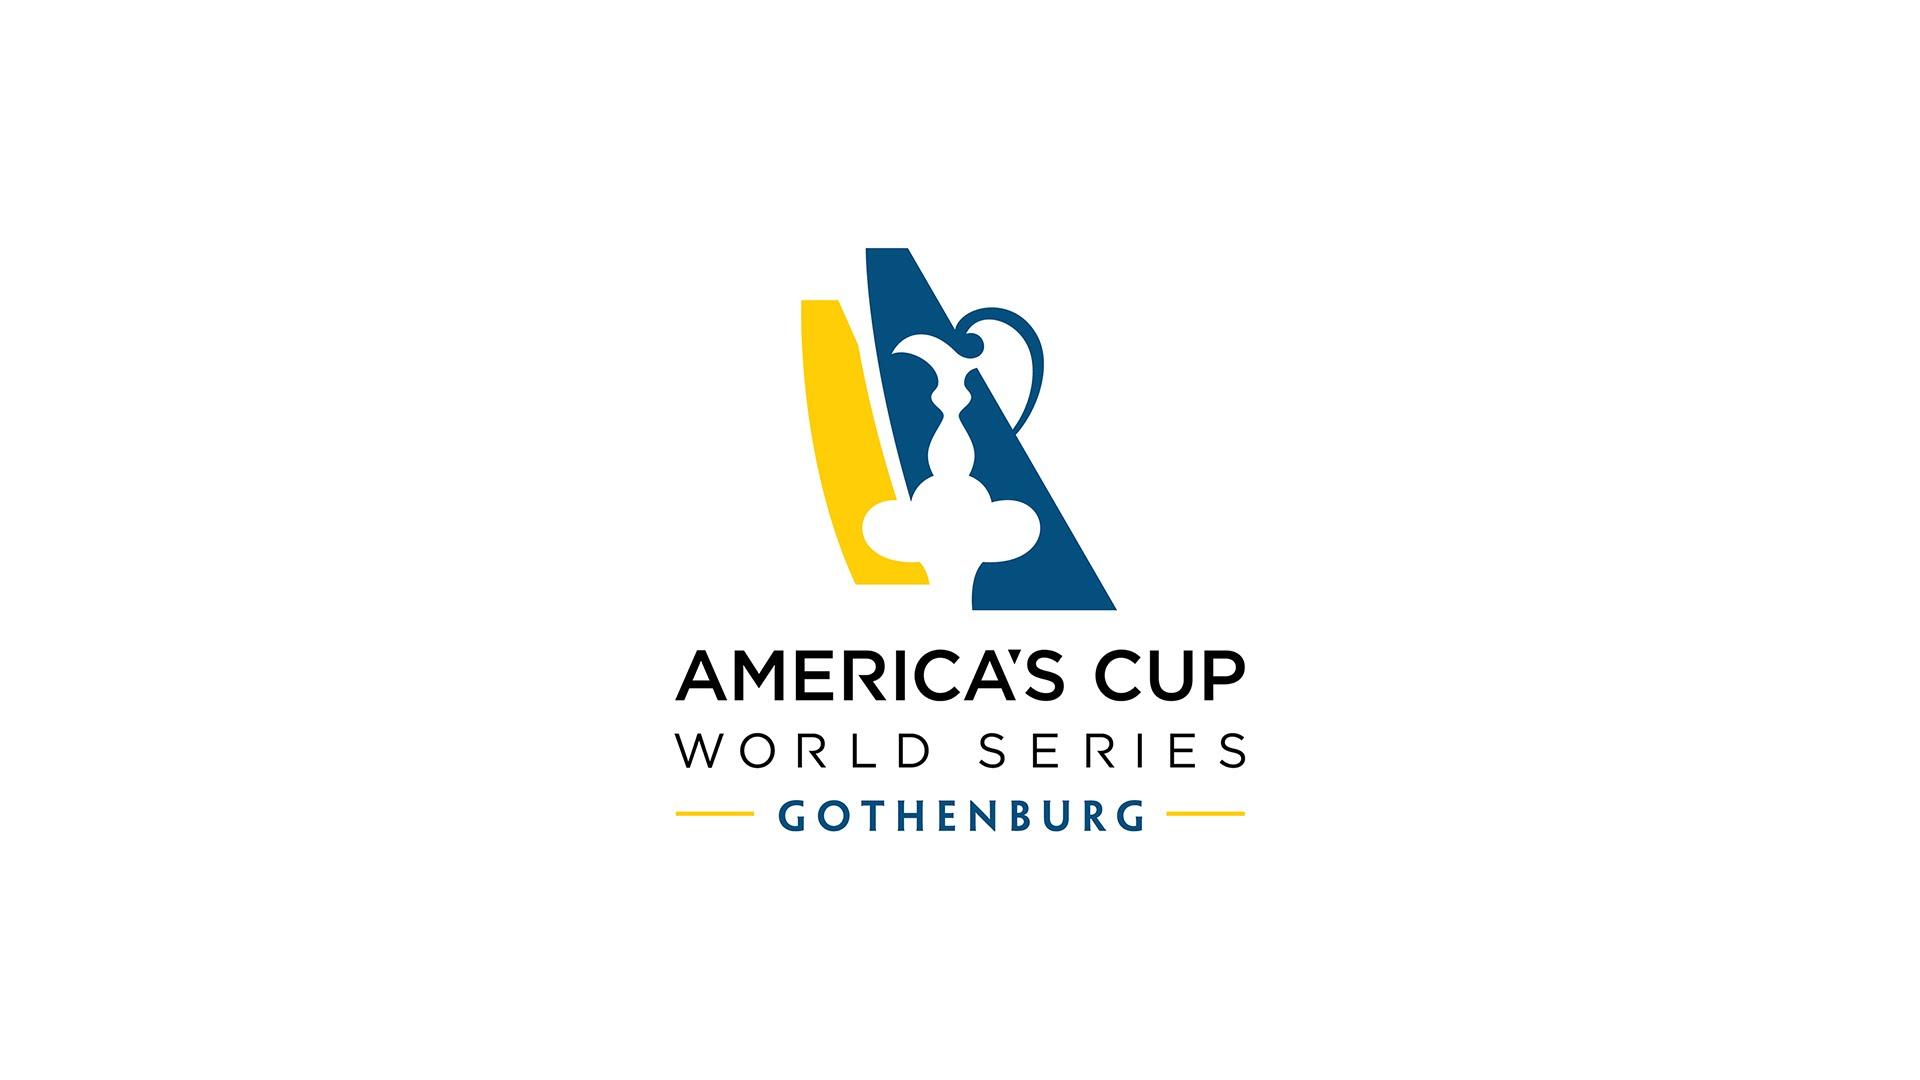 America's Cup World Series till Göteborg